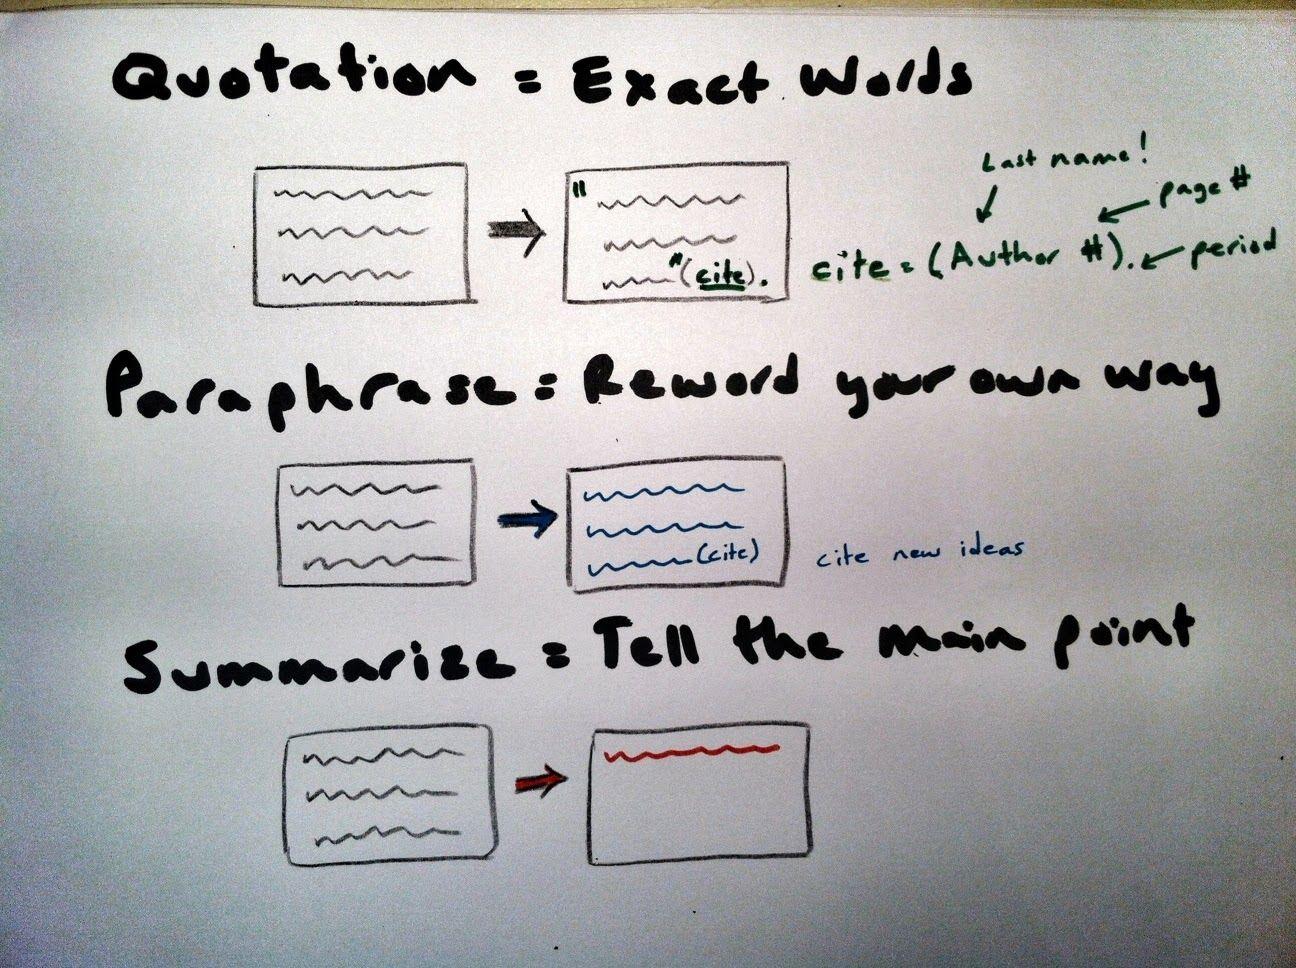 Try Curiosity Summarize Paraphrase Quote Teacher Project Teaching Writing Workshop Bio